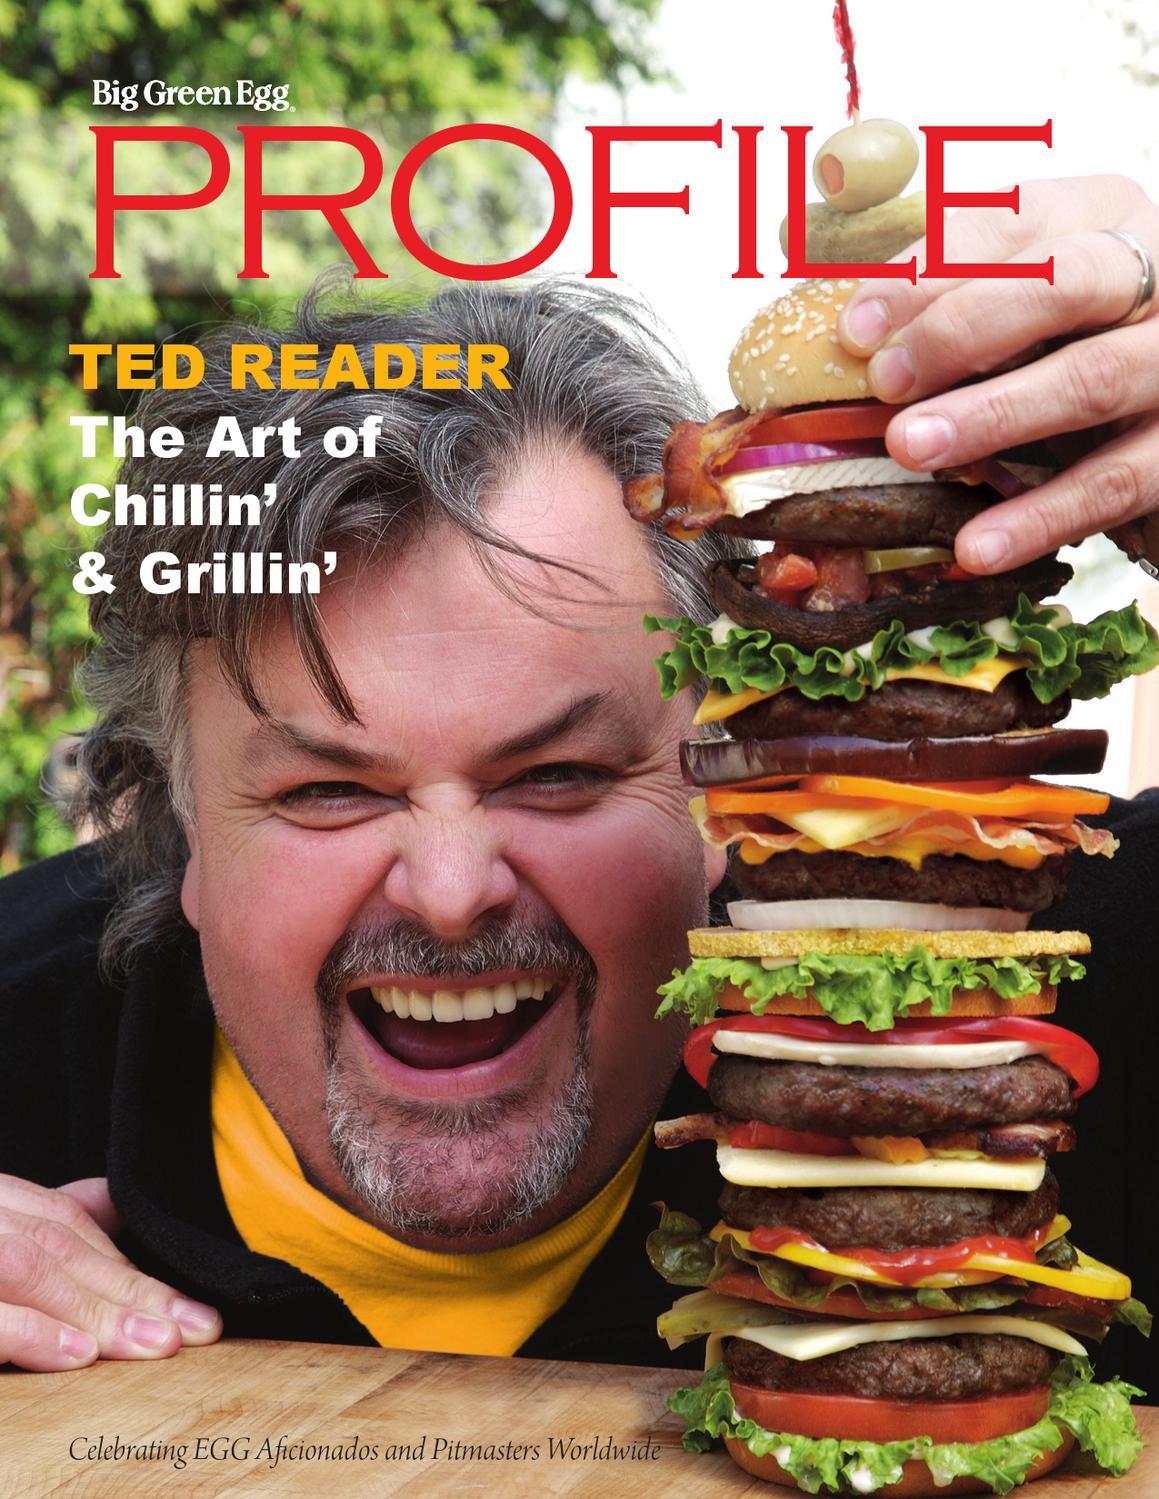 Bge Profile Ted Reader By Big Green Egg Issuu border=